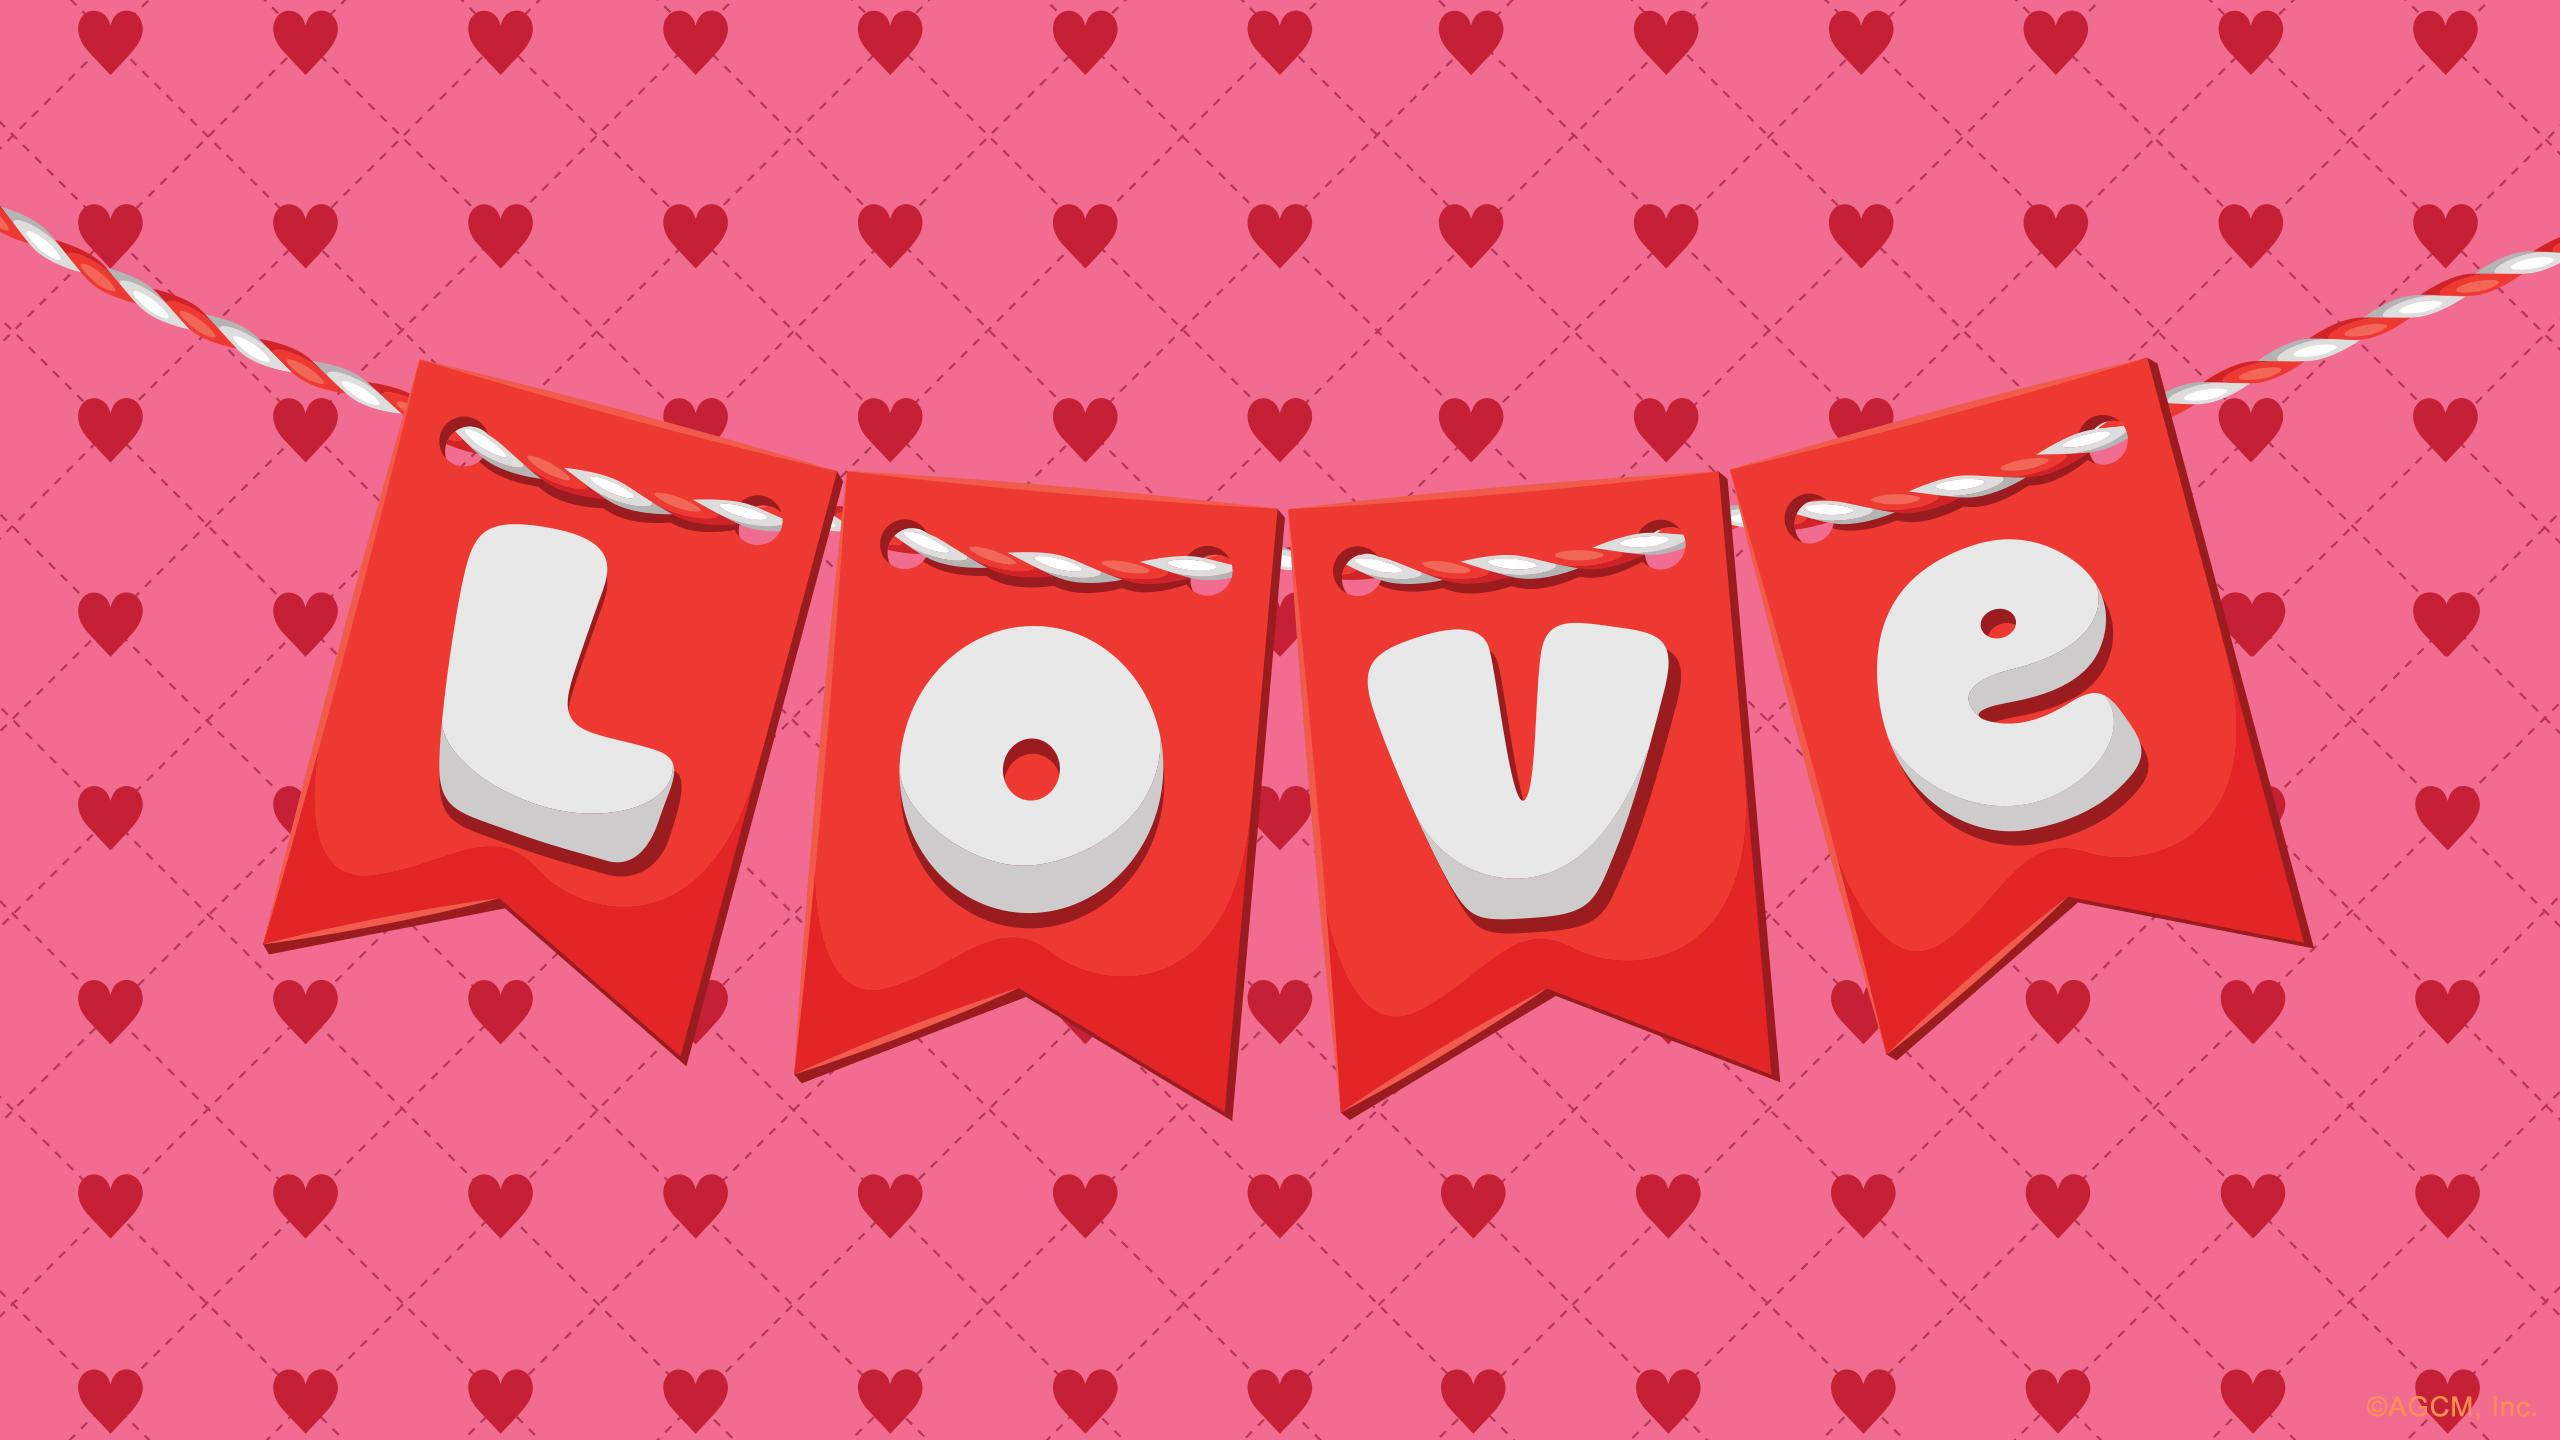 Valentines Day Desktop Wallpaper 2560x1440